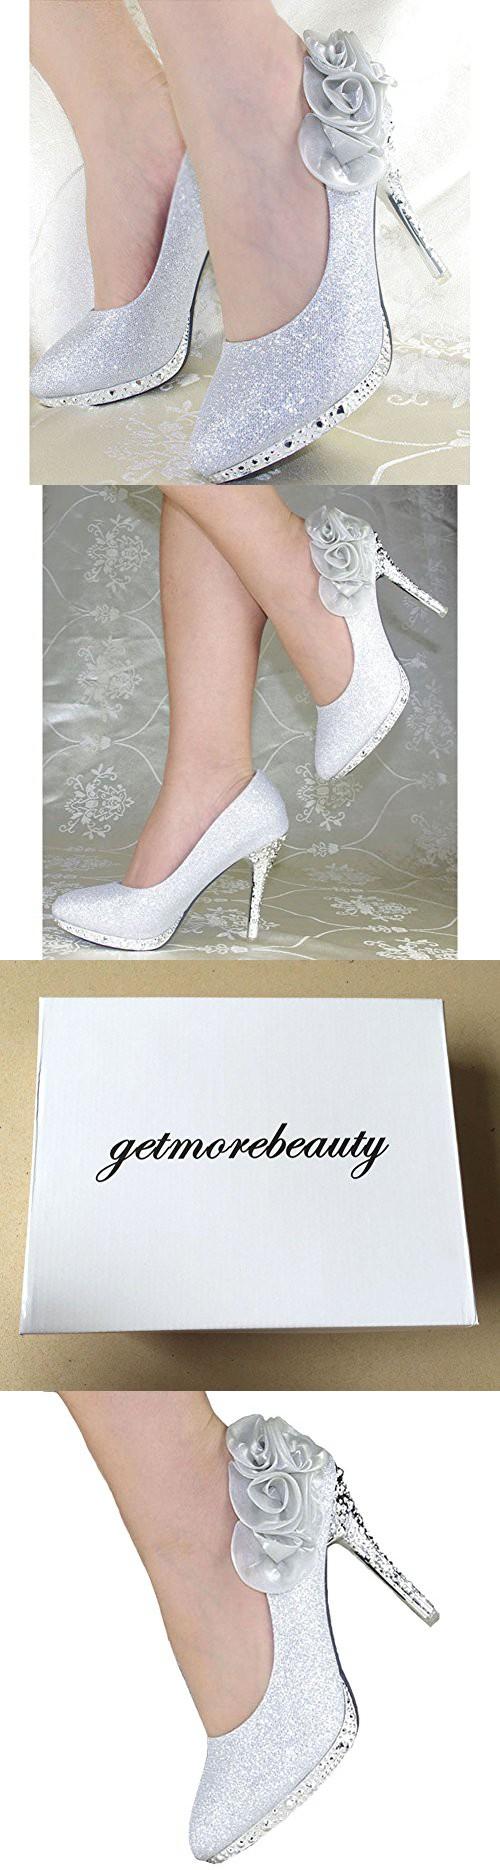 49c9774e328 Getmorebeauty Women s Silver Rose Flower Crystal Glitter Wedding Shoes 9 B(M)  US